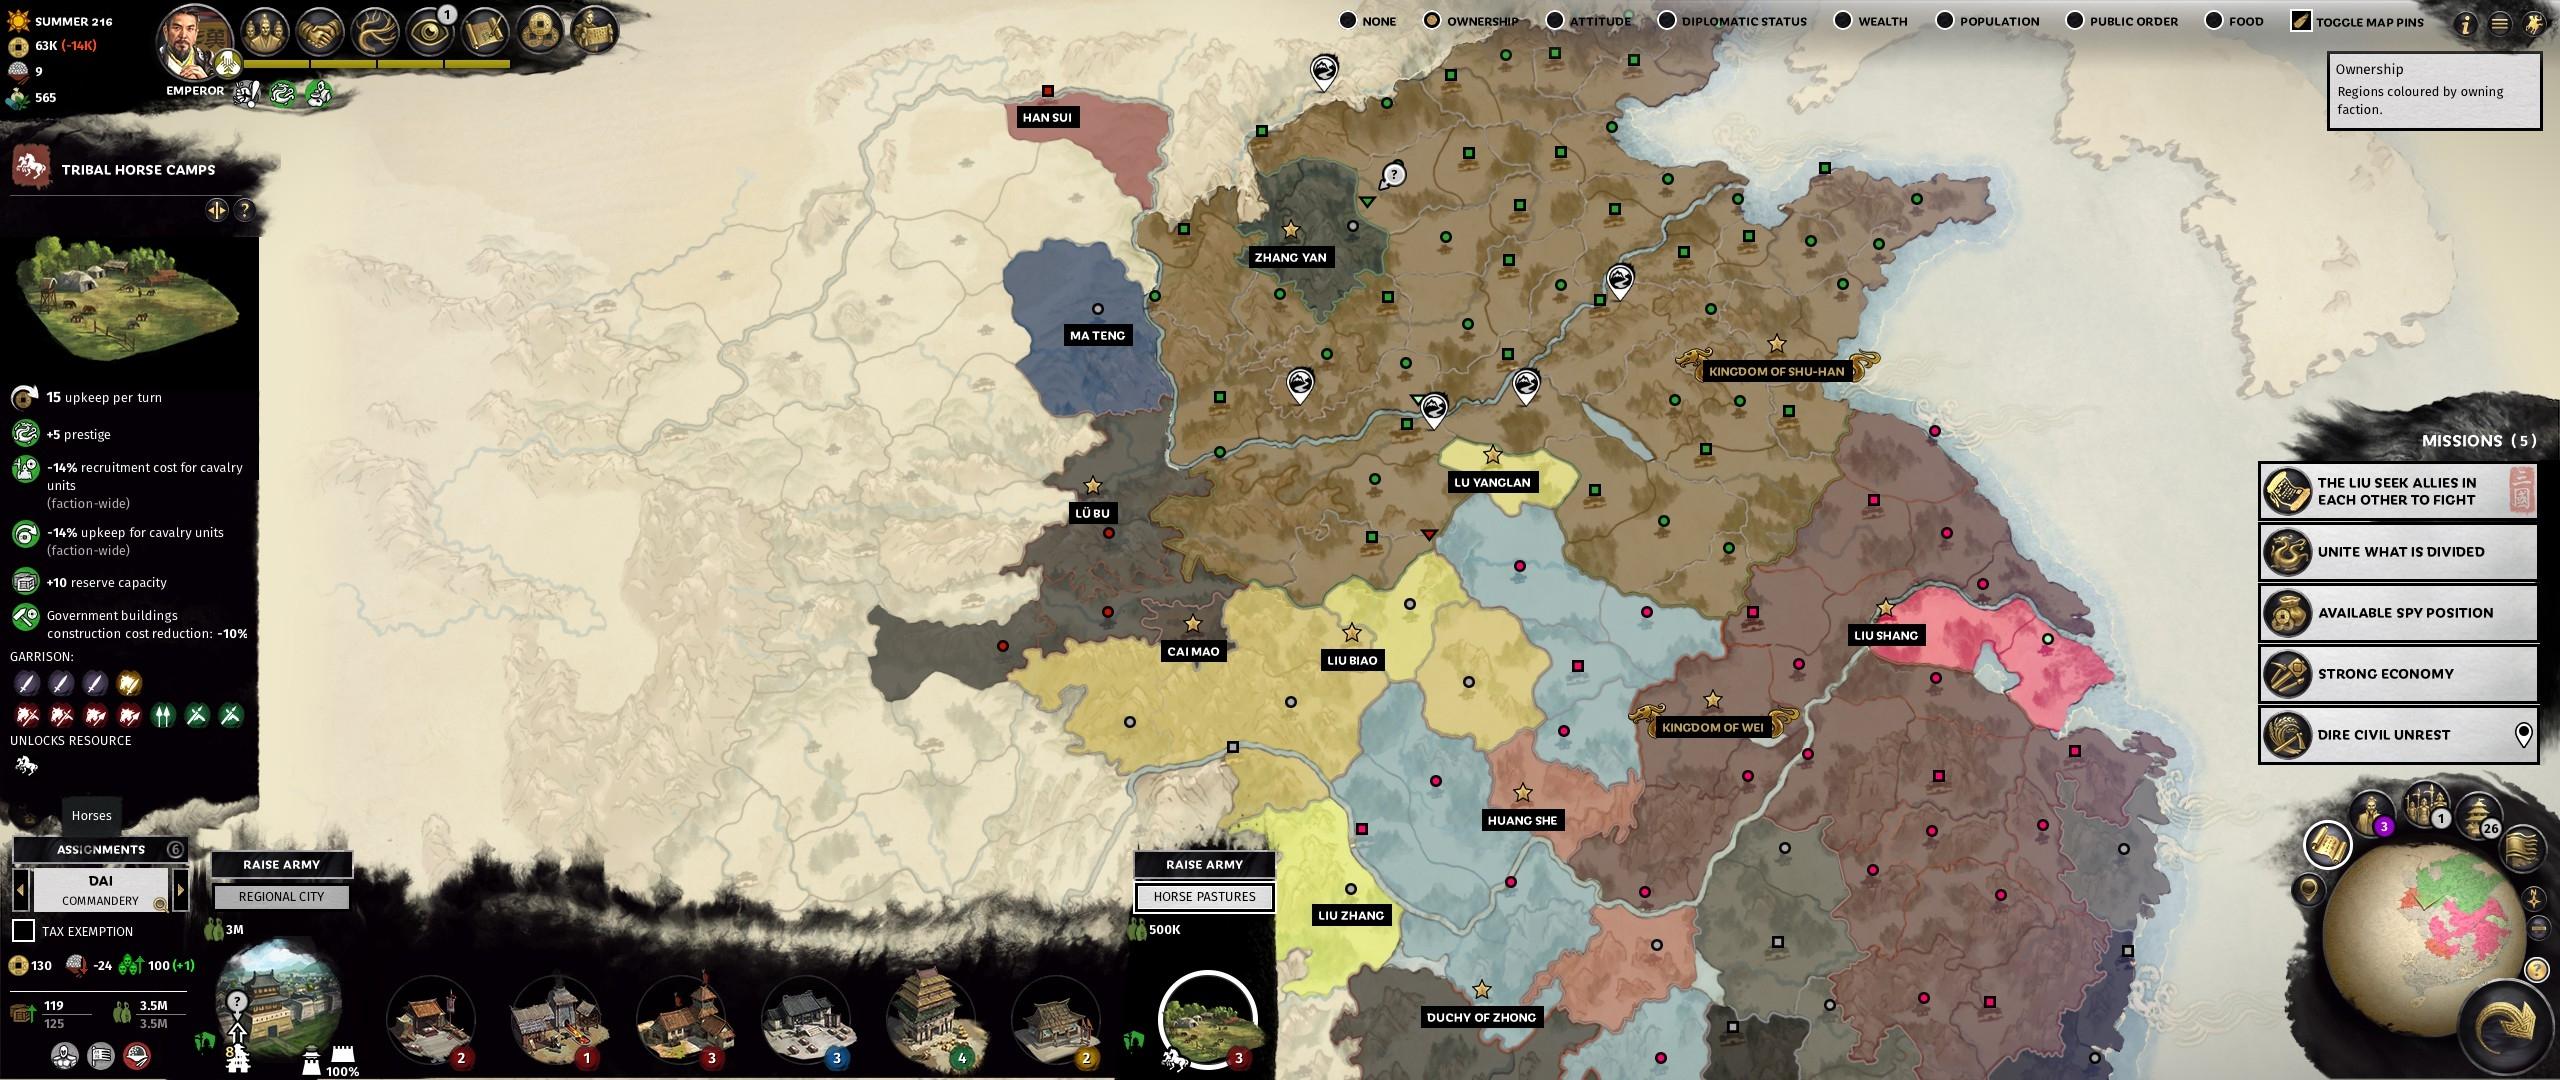 Total War: Three Kingdoms Review - The Emperor Returns